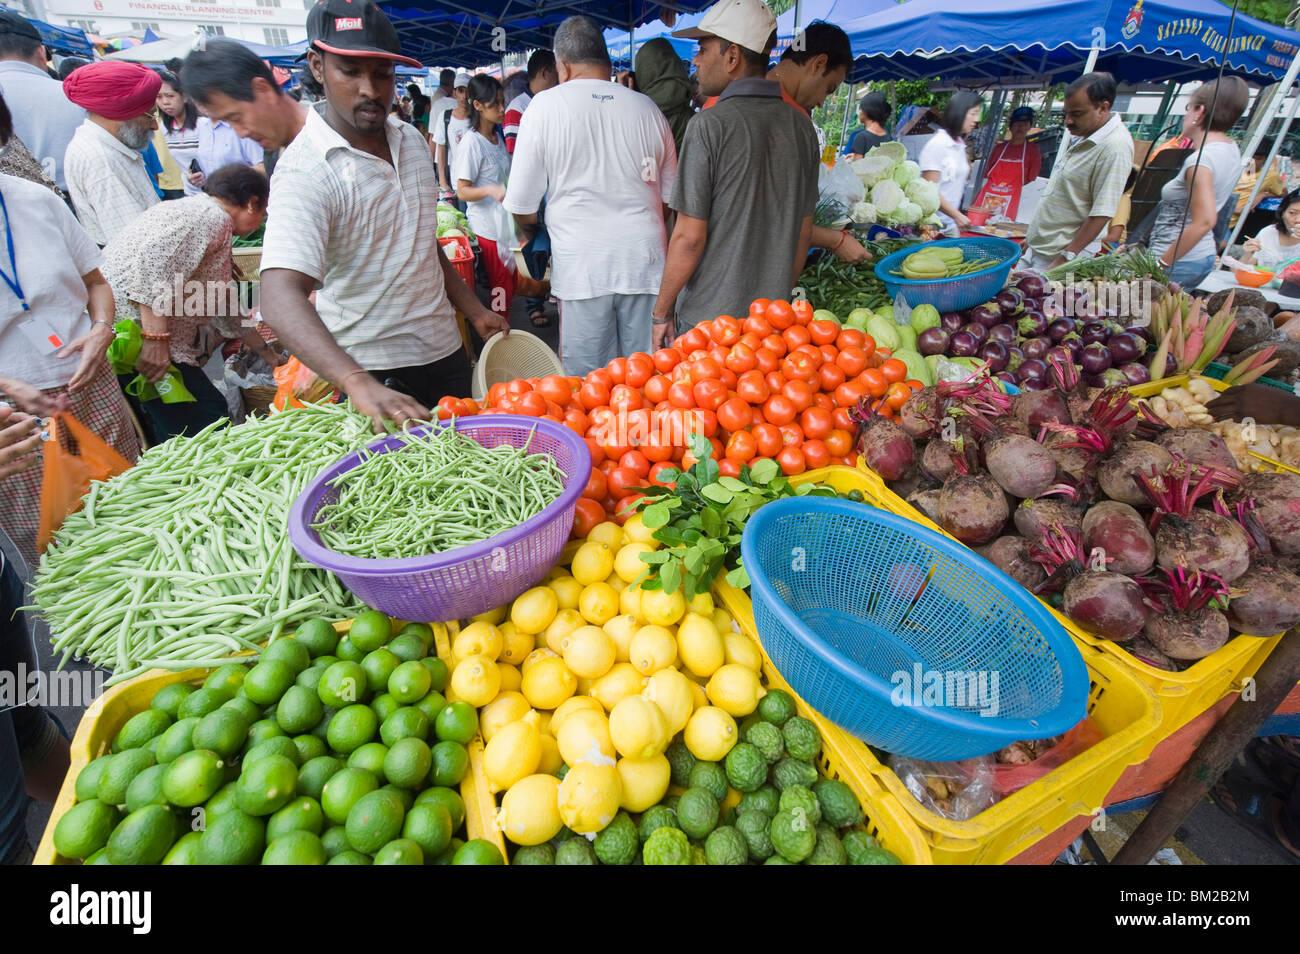 Bangsar Sunday market, Kuala Lumpur, Malaysia, Southeast Asia - Stock Image